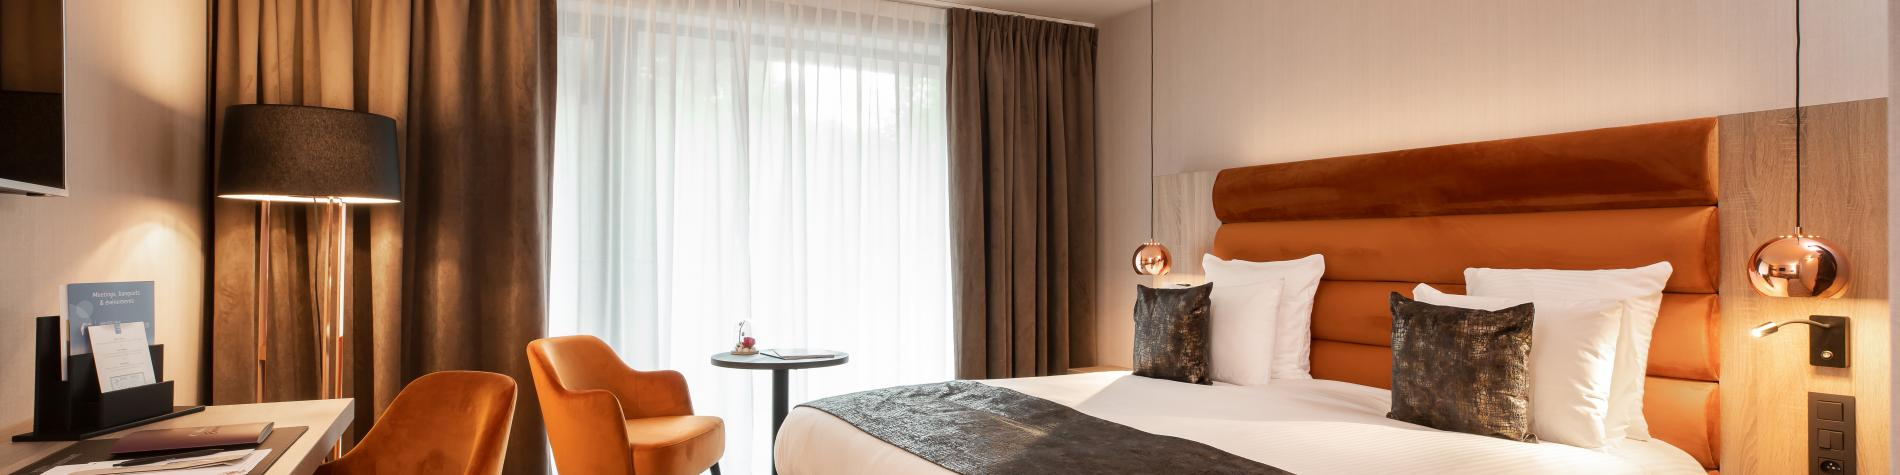 Hôtel & restaurant - Van der Valk Hôtel - Nivelles Sud